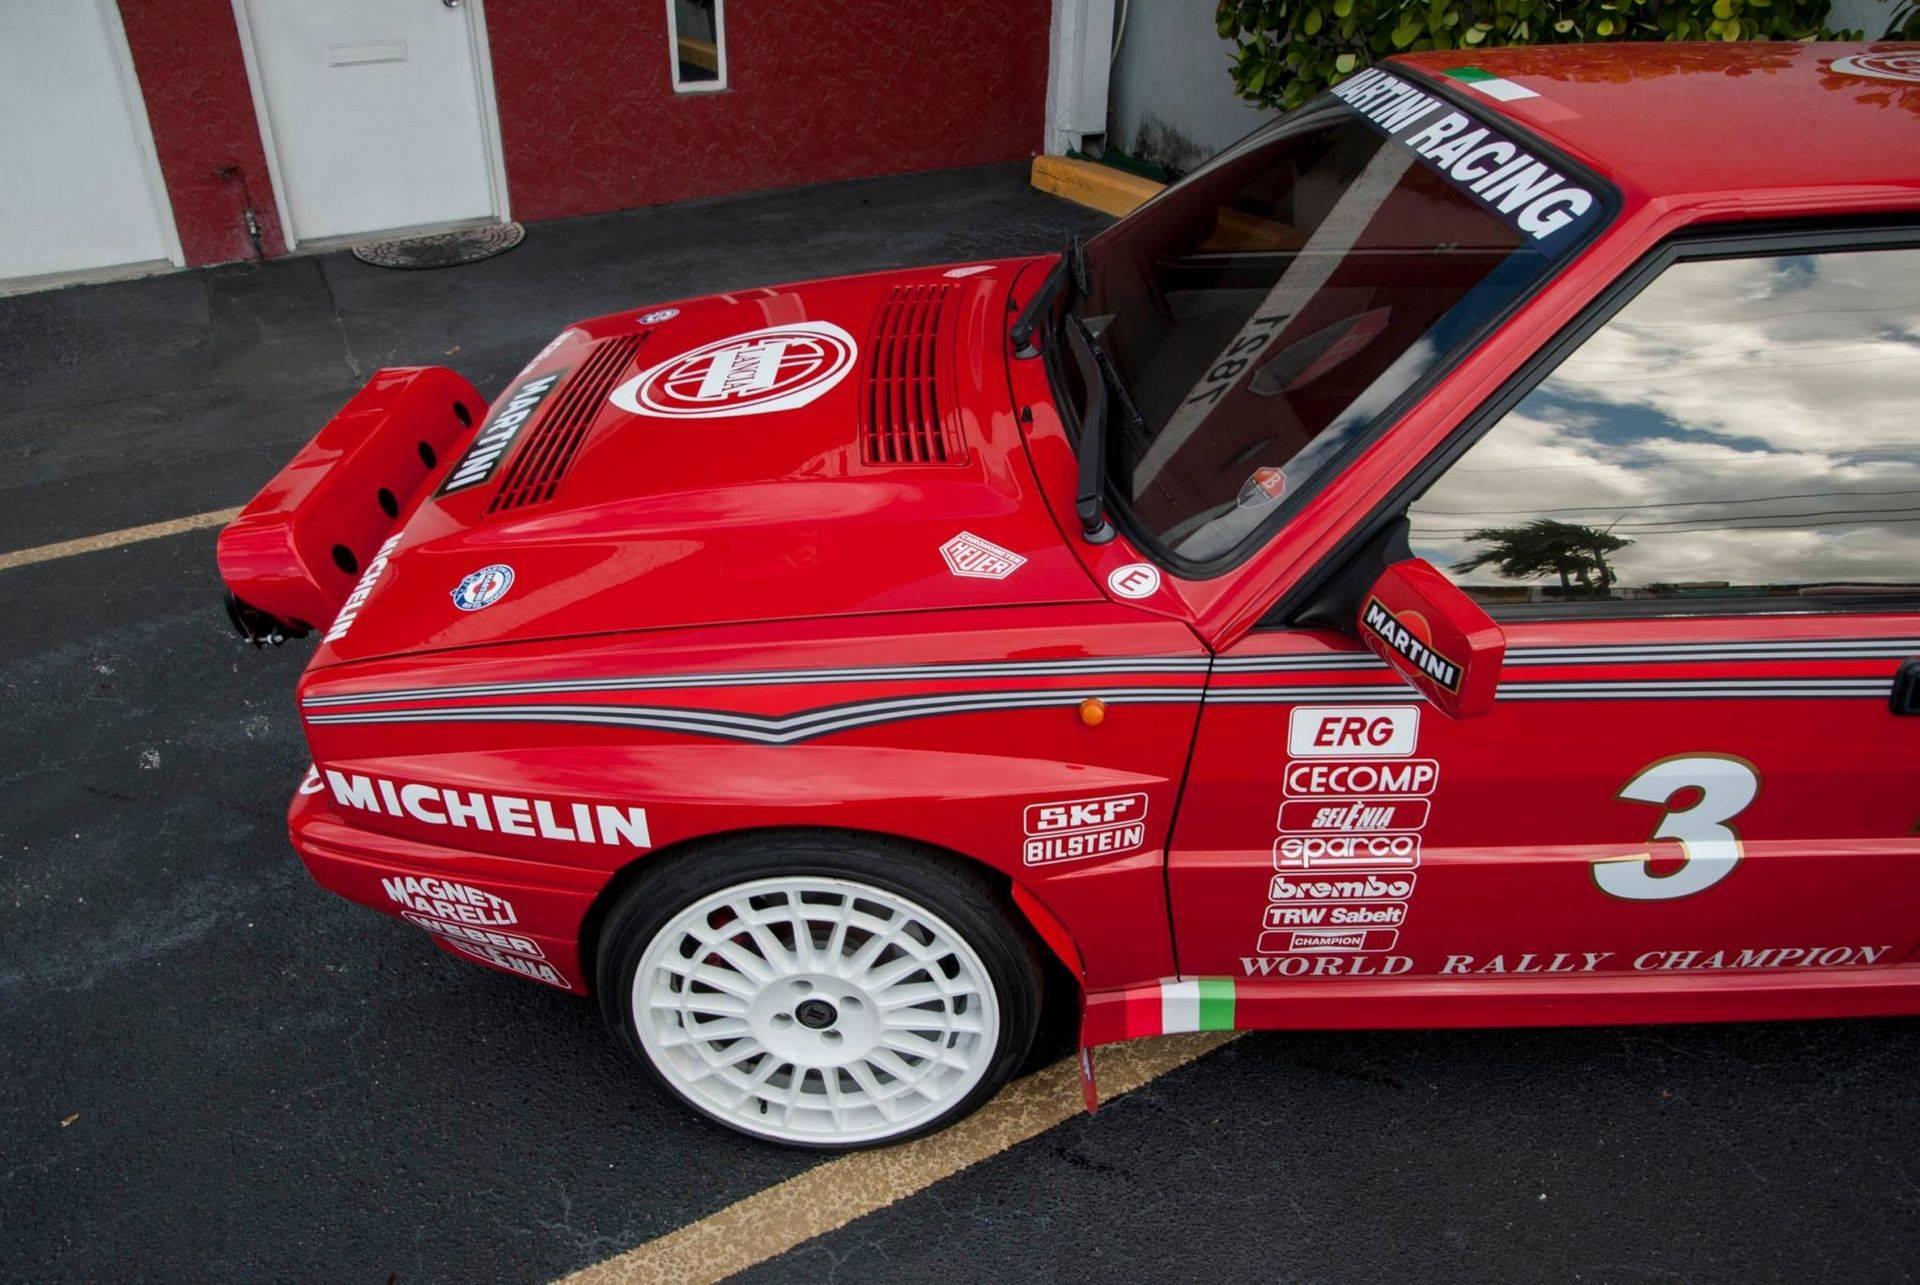 Lancia-Delta-Integrale-8V-1989-59